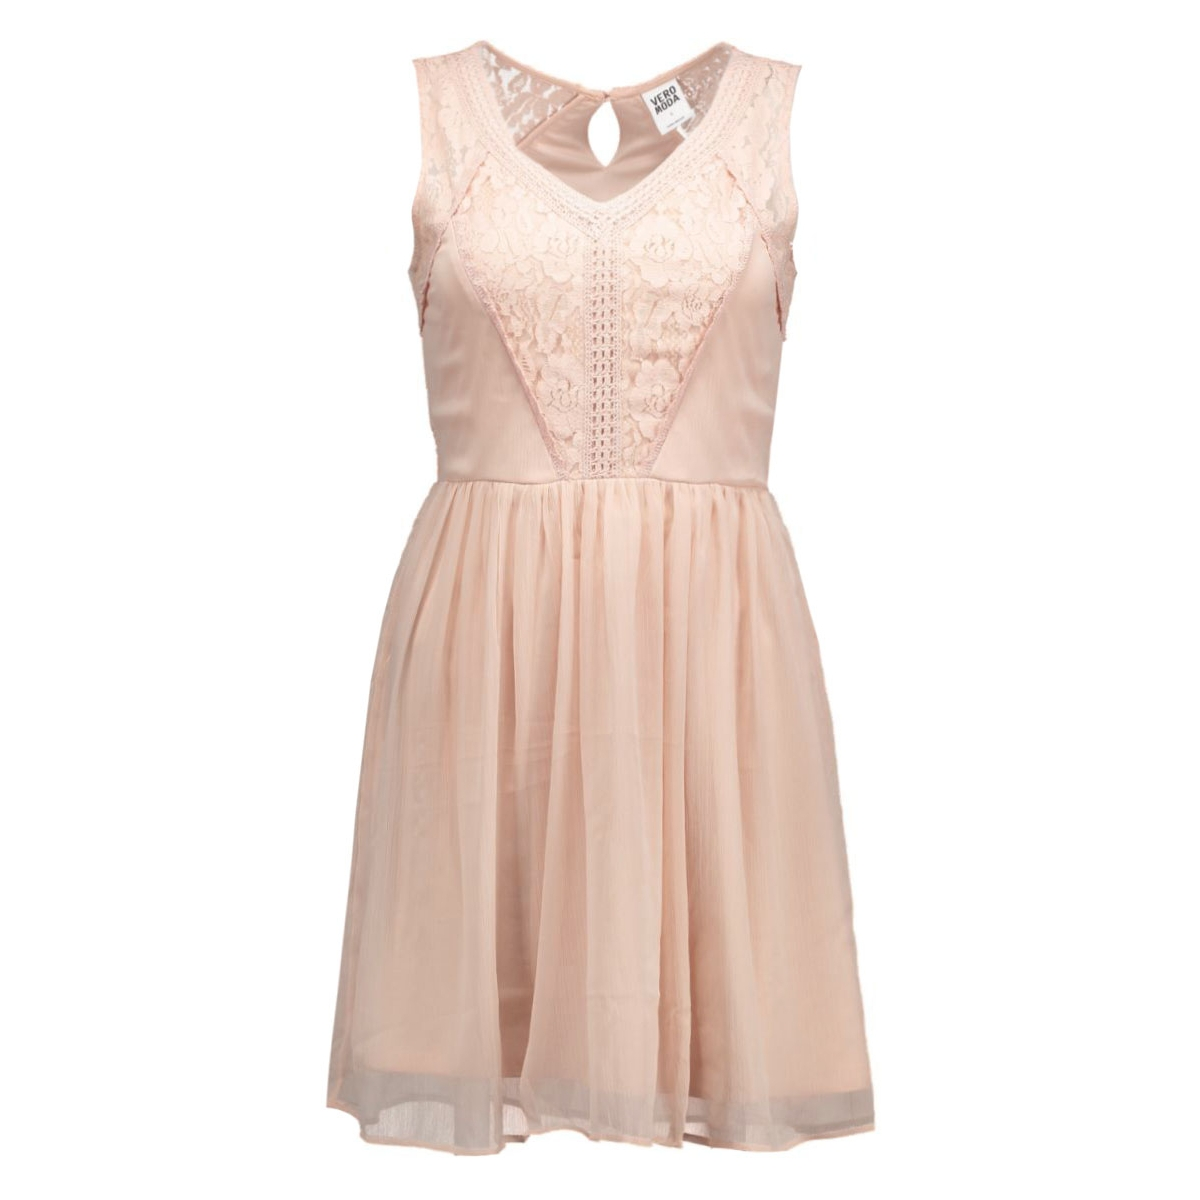 vmfreja mini dress 10149617 2 vero moda jurk rose dust